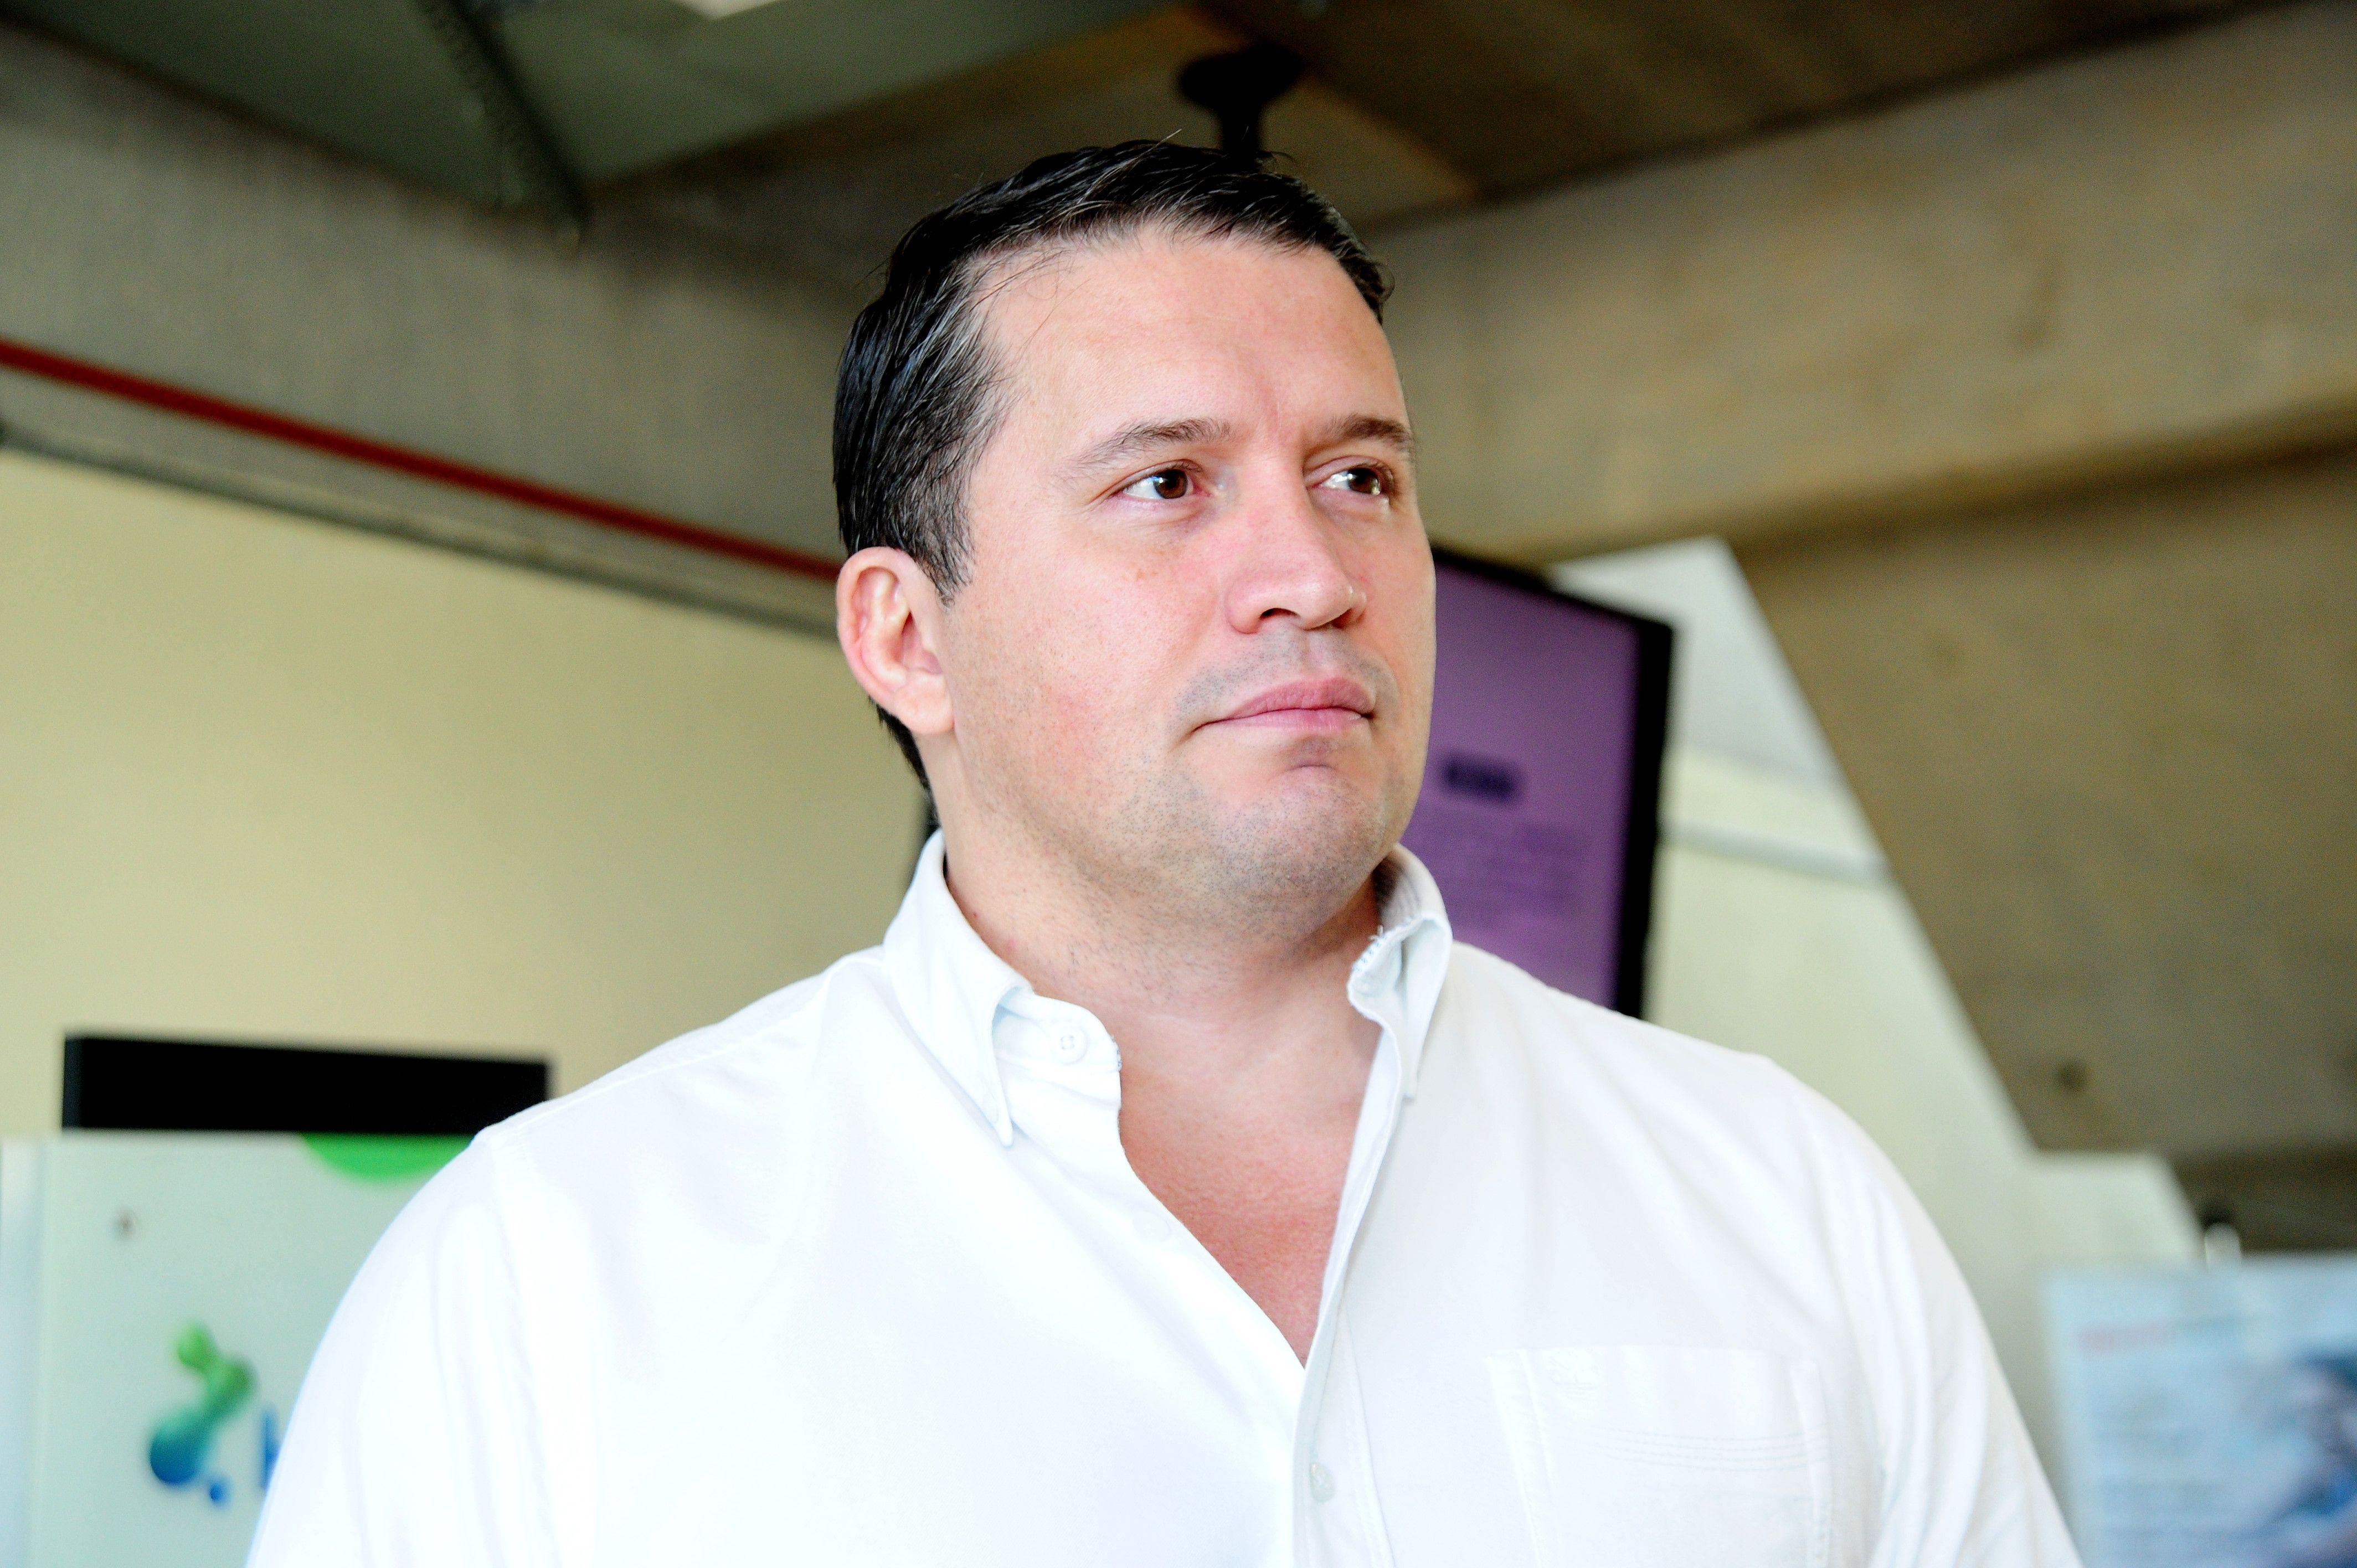 Roberto Freitas, presidente do PTS. Crédito da foto: Emidio Marques